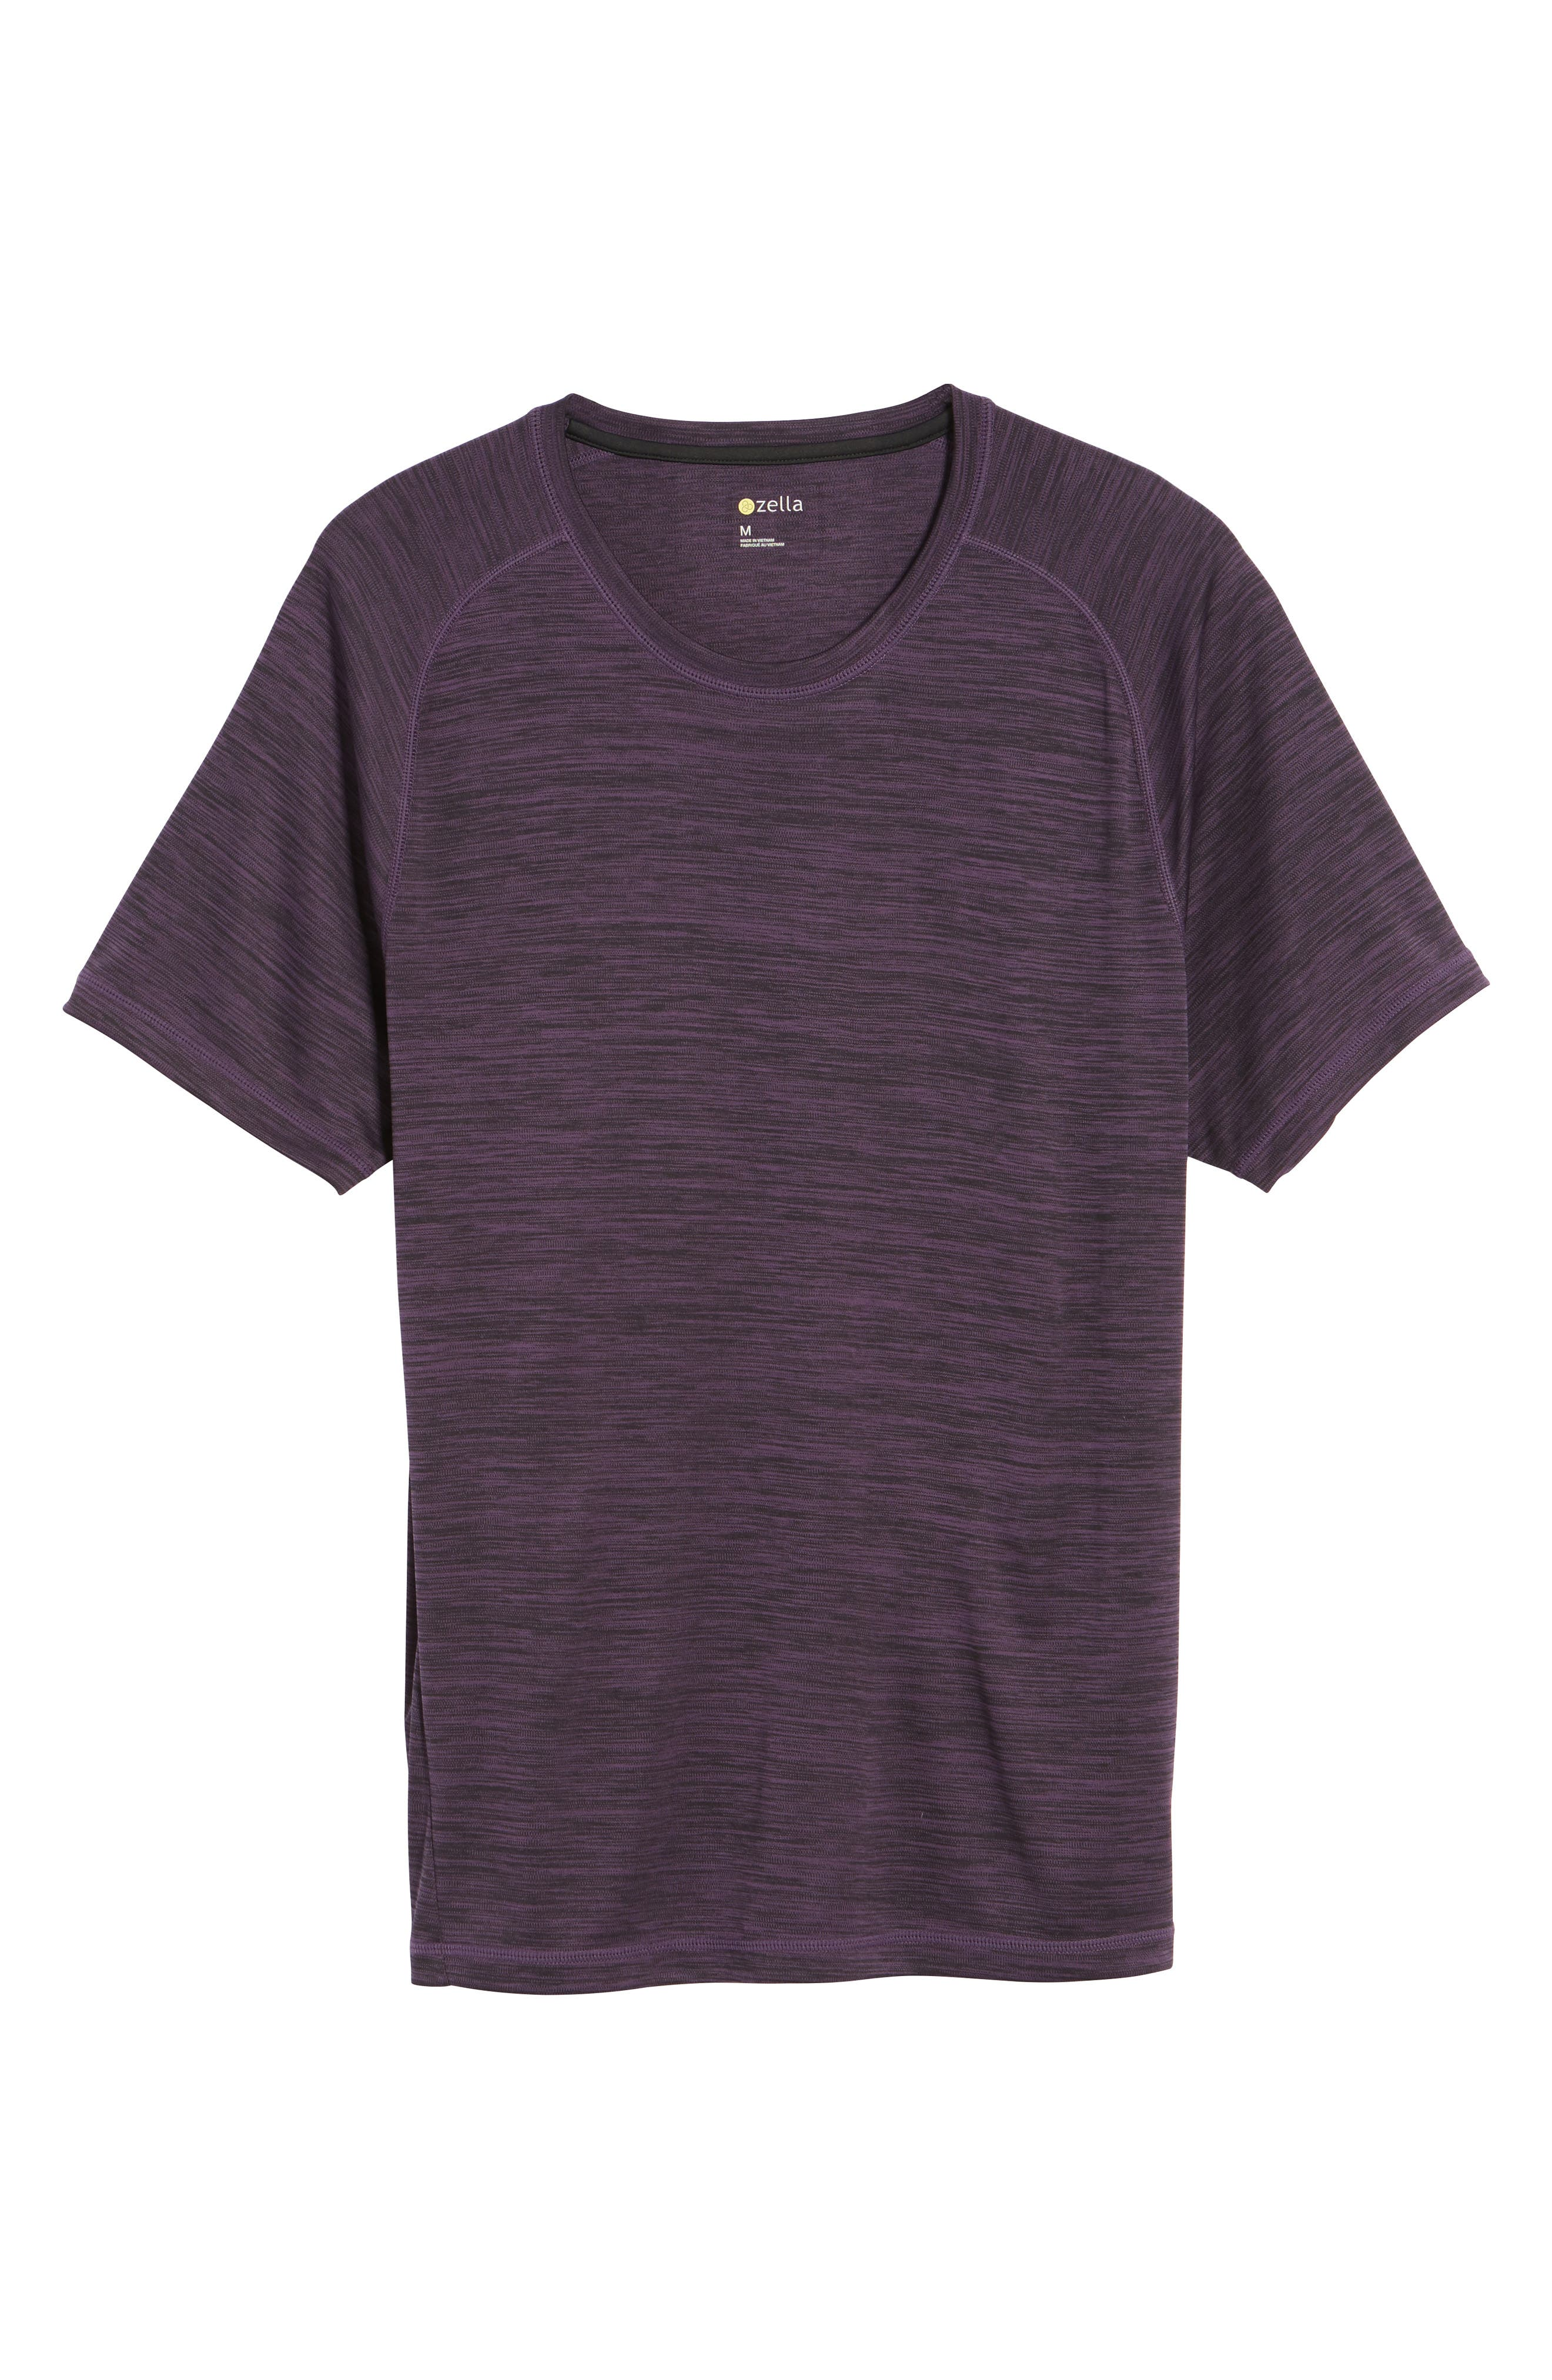 Triplite T-Shirt,                             Alternate thumbnail 77, color,